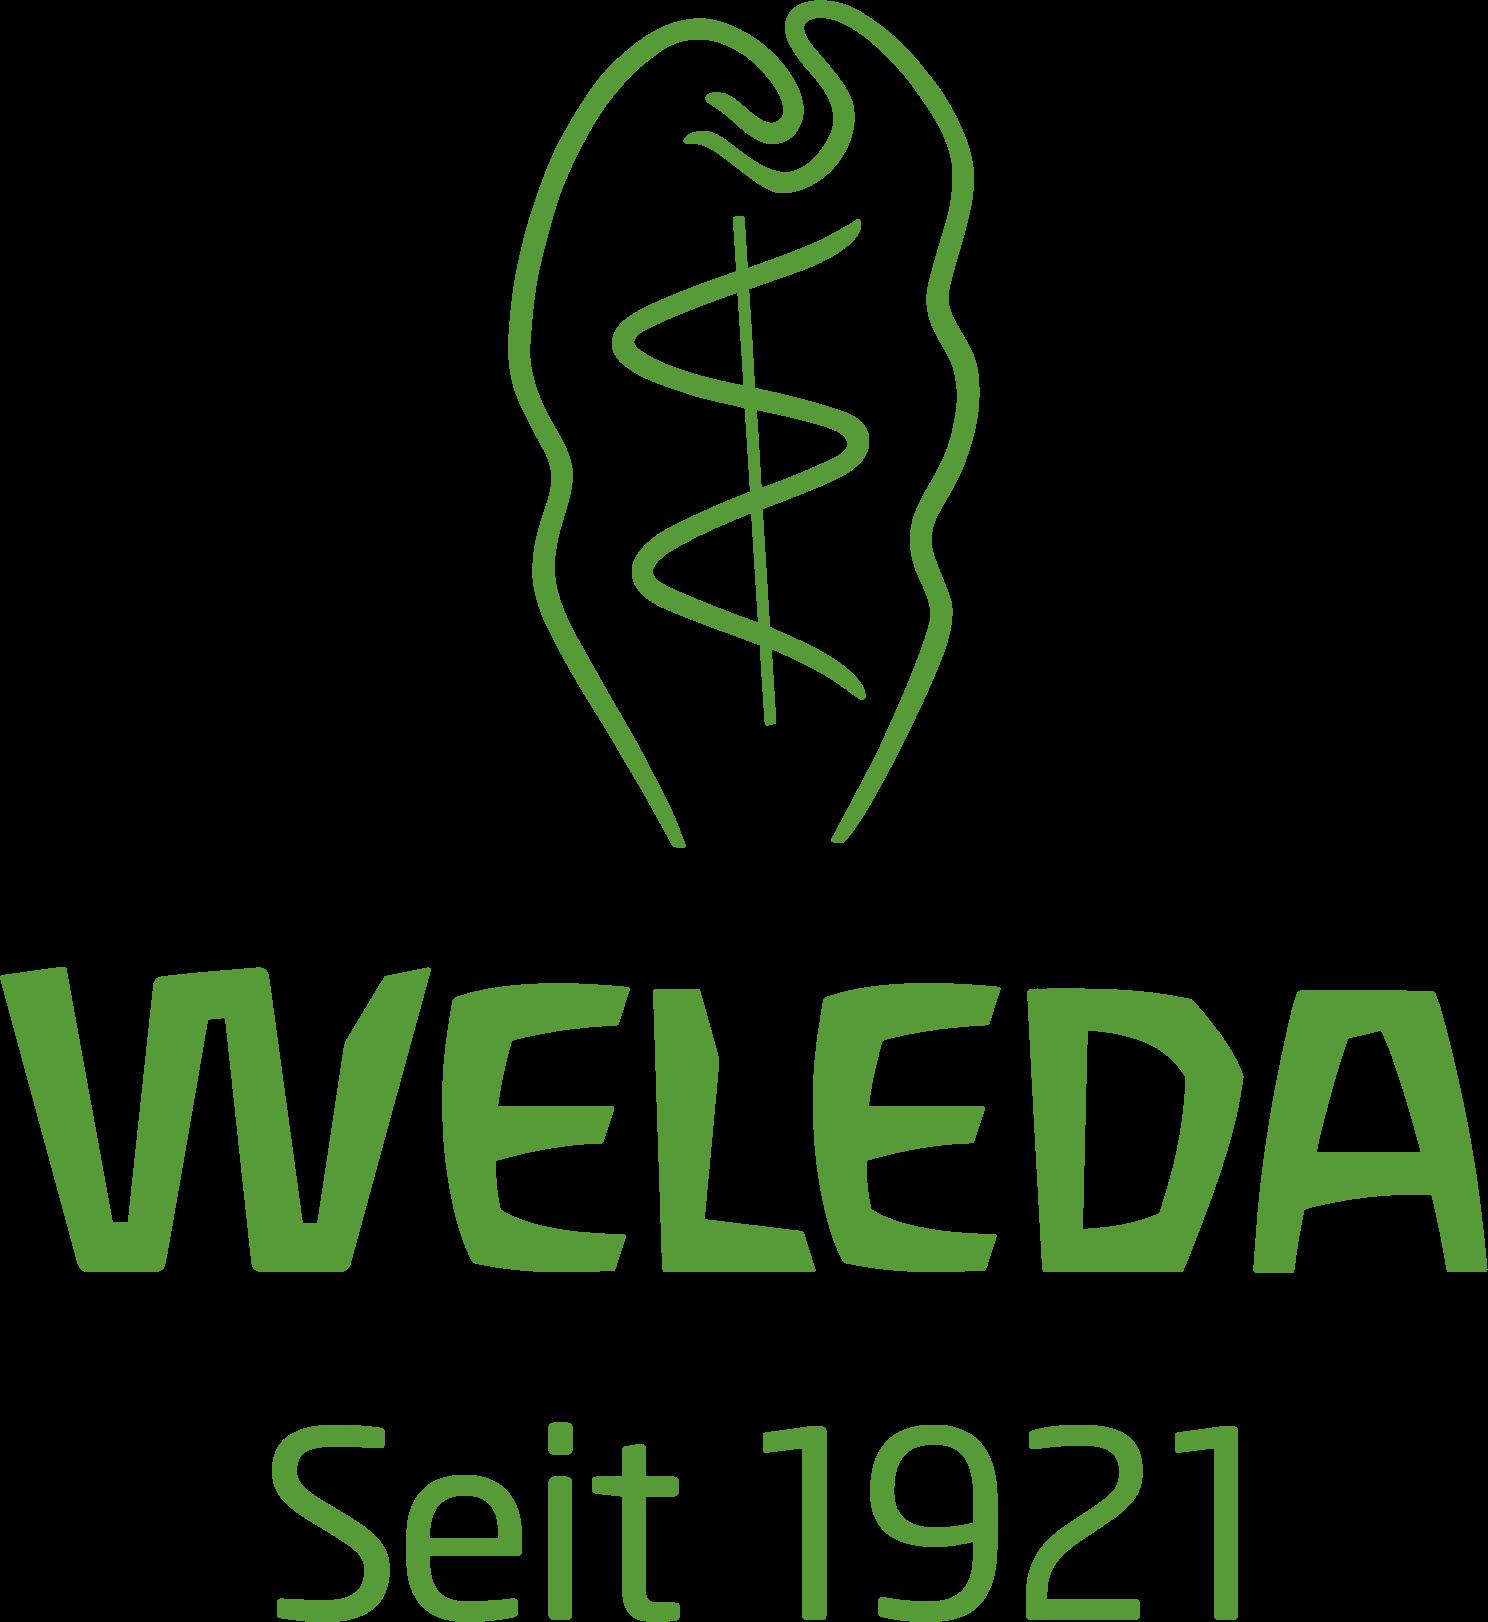 Weleda Logo png